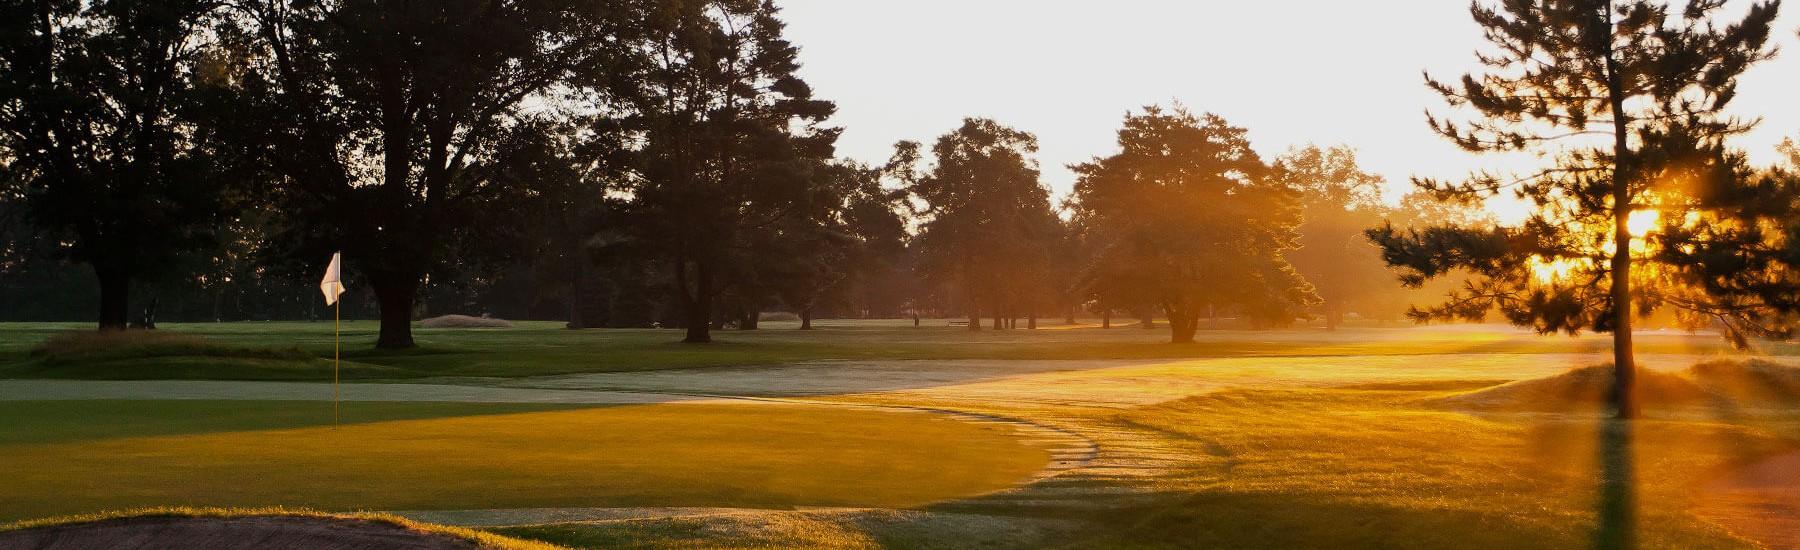 Golf Award-Winning Courses